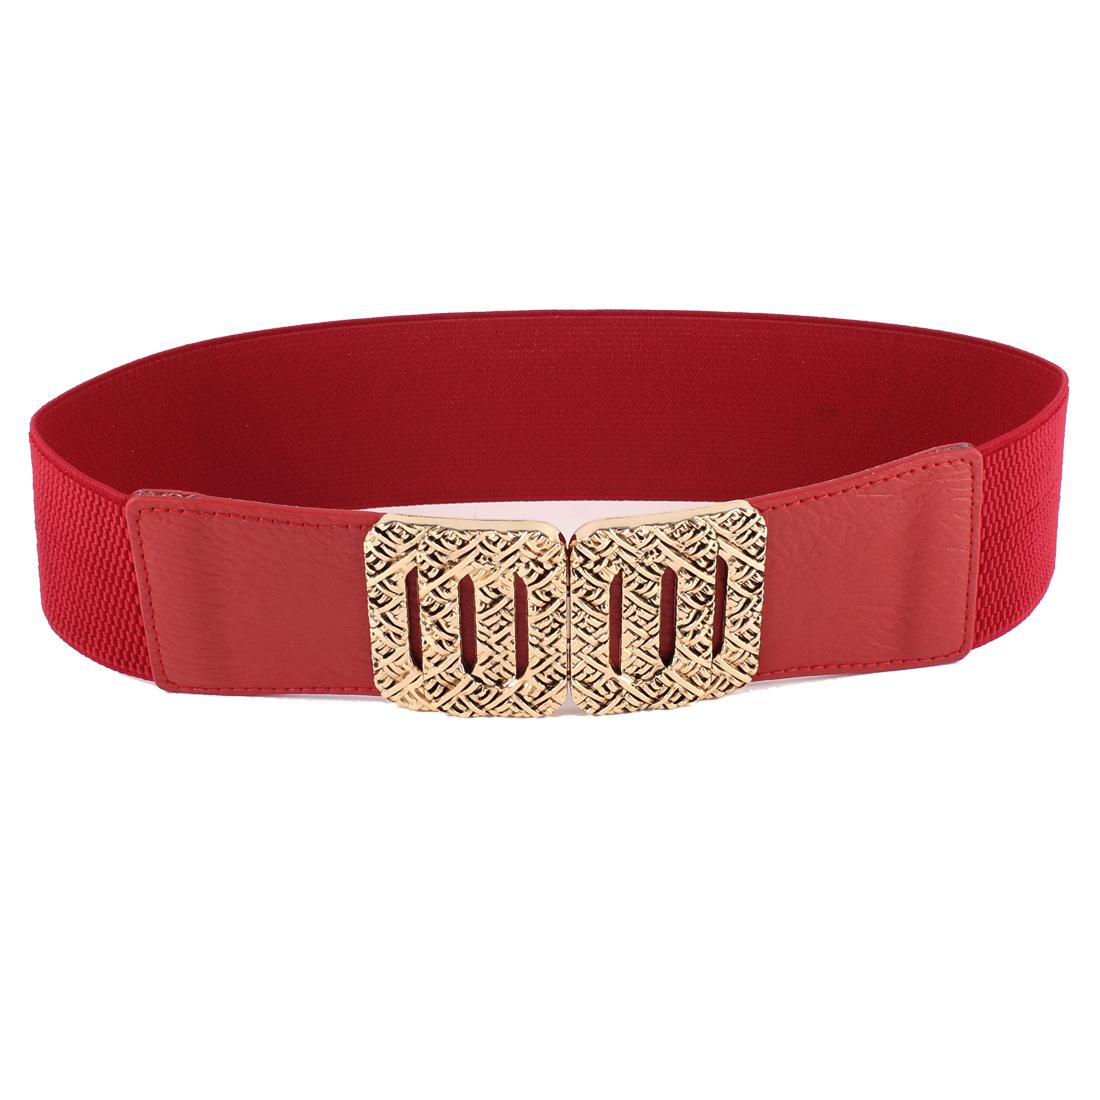 Rectangular Interlocking Closure Cinch Waist Belt Waistband Red for Ladies